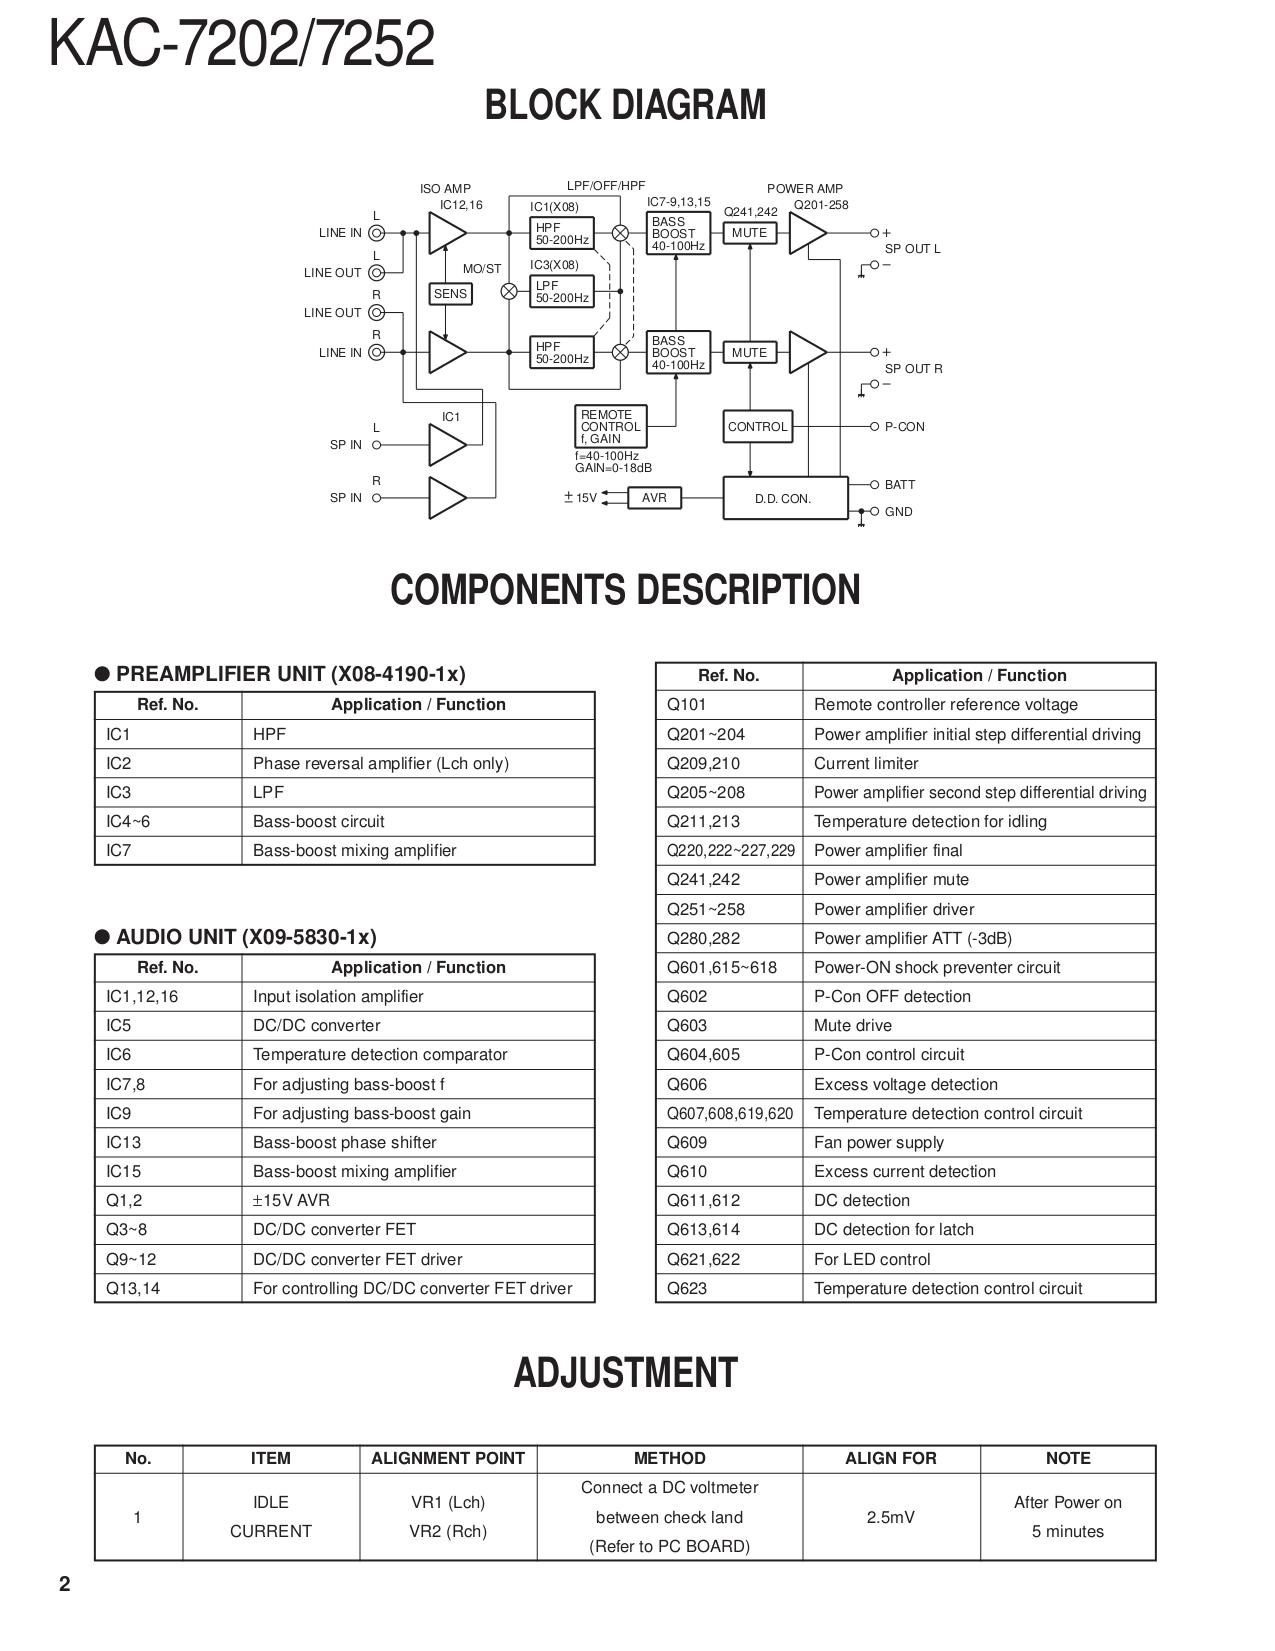 Kenwood Mac 7285 Amp Wiring Diagram on dual car audio wiring diagram, visonik wiring diagram, kenwood radio diagram, fusion wiring diagram, kenwood ddx419 wiring-diagram, kenwood kdc 210u wiring diagrams, focal wiring diagram, sub and amp wiring diagram, kenwood ddx6019 wiring-diagram, stereo wiring diagram, alpine type r 12 wiring diagram, kenwood kdc bt555u wiring-diagram, mitsubishi car radio wiring diagram, surround sound systems wiring diagram, cerwin vega wiring diagram, kenwood model kdc wiring-diagram, kenwood radio wiring schematic, car amplifier wiring diagram, alpine car audio wiring diagram, panasonic wiring diagram,